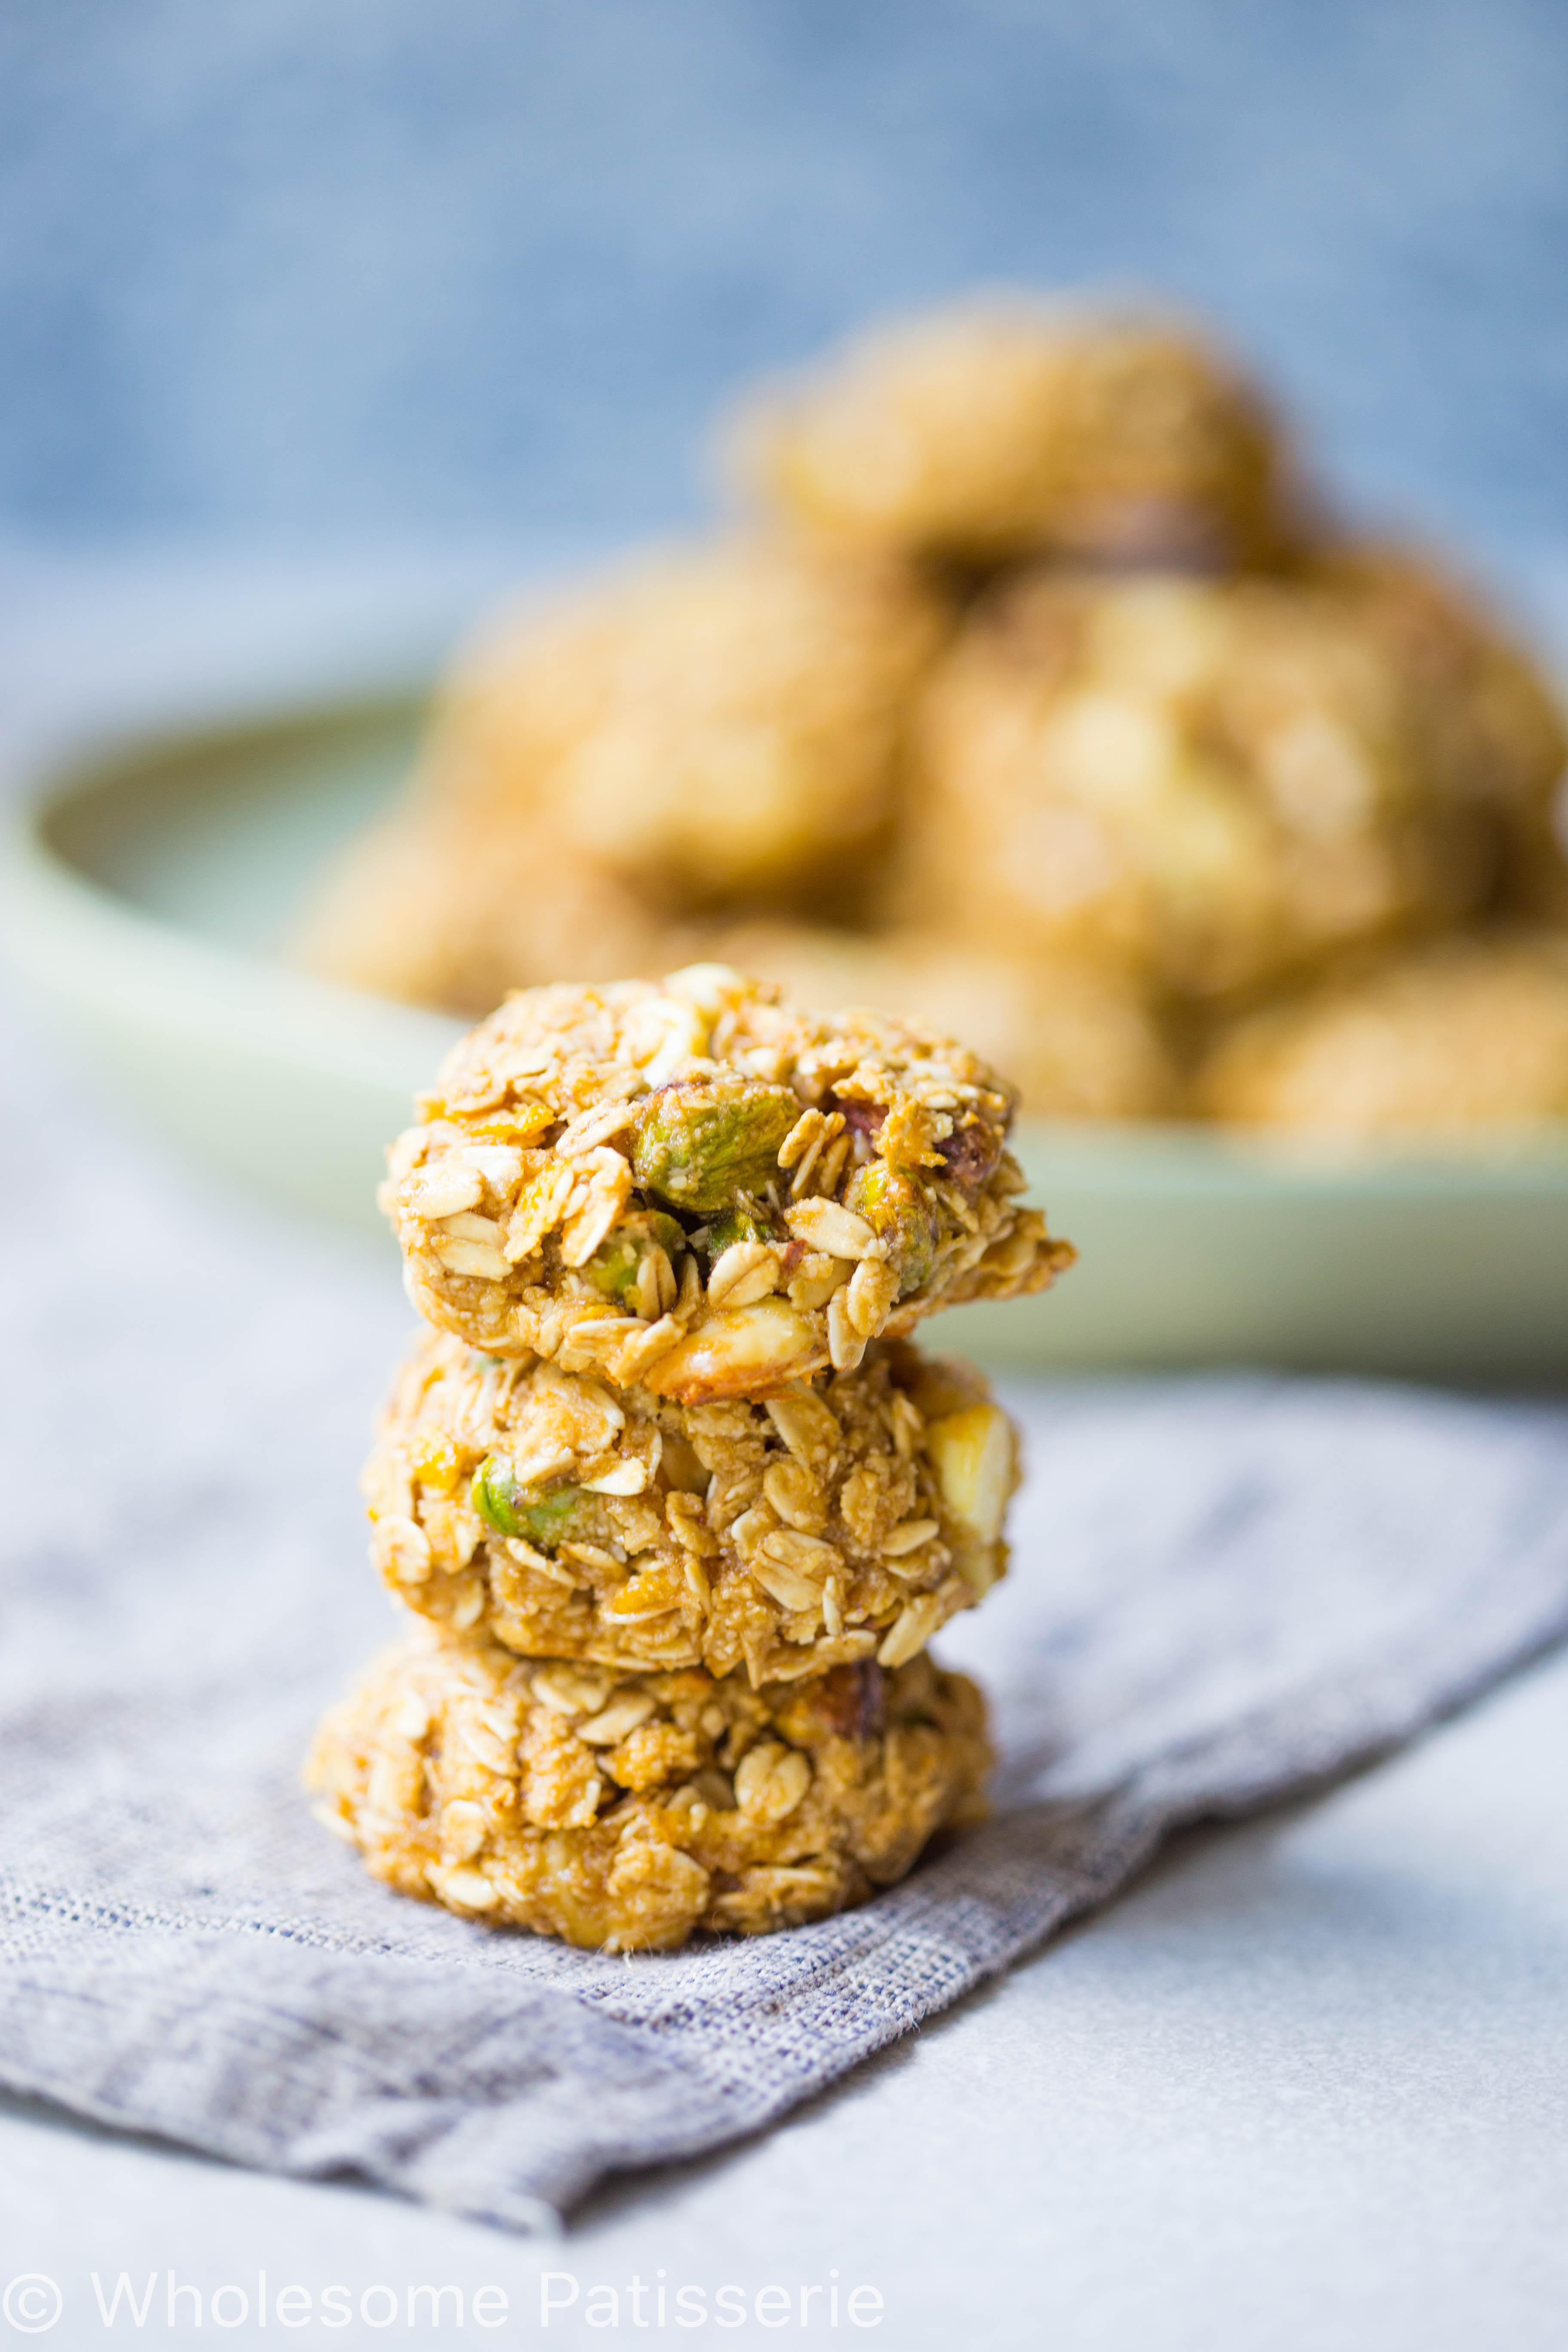 gluten-free-pistachio-white-chocolate-oat-cookies-dairy-free-easy-under-30-minutes-vegetarian